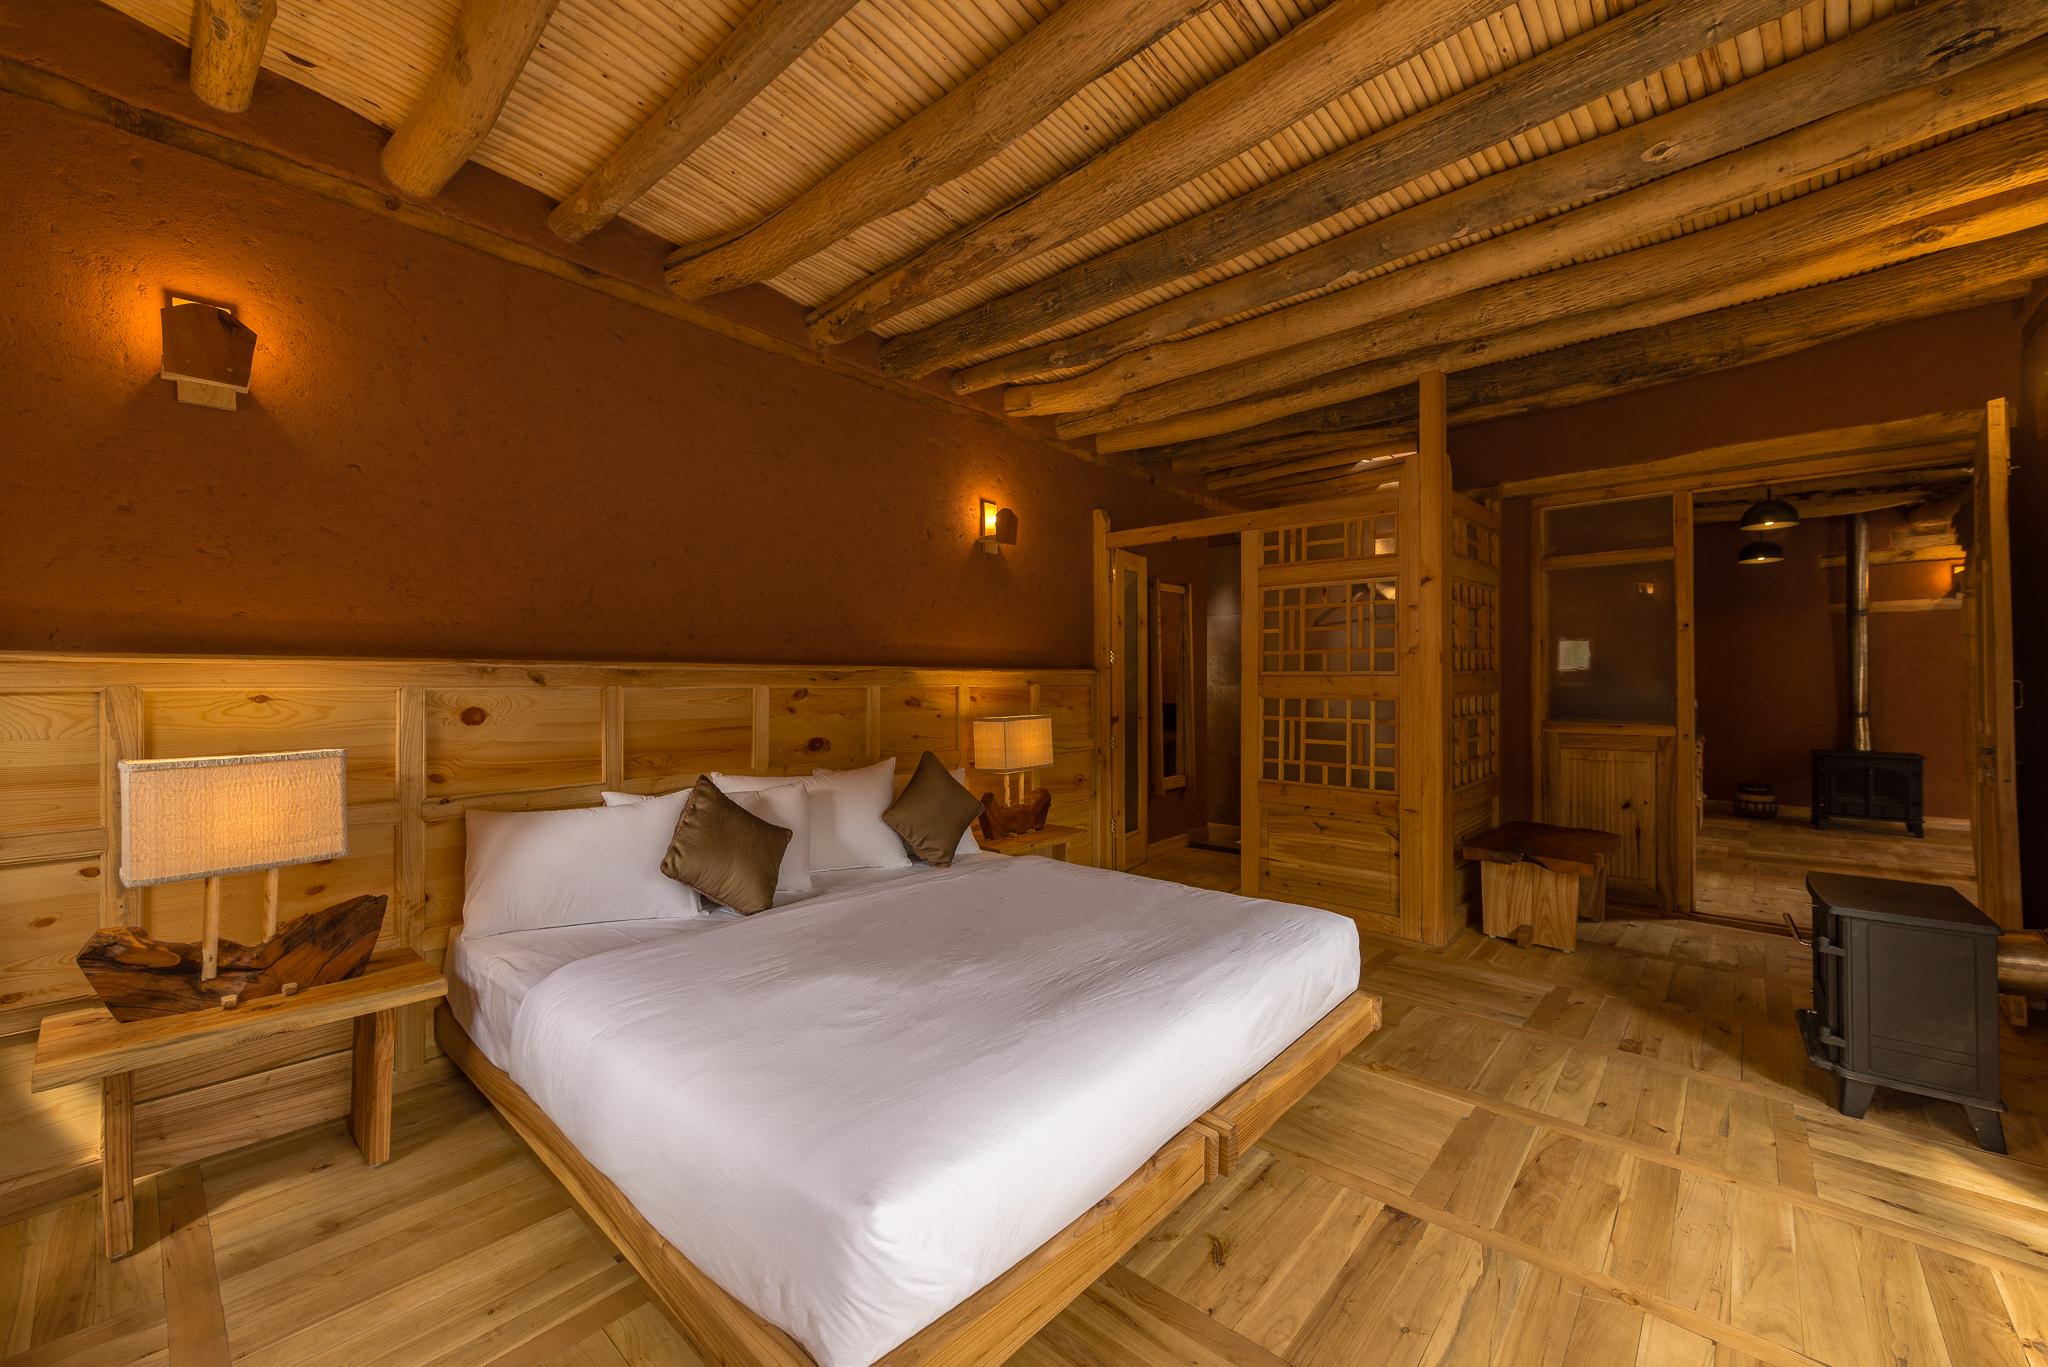 Bed room2.jpg